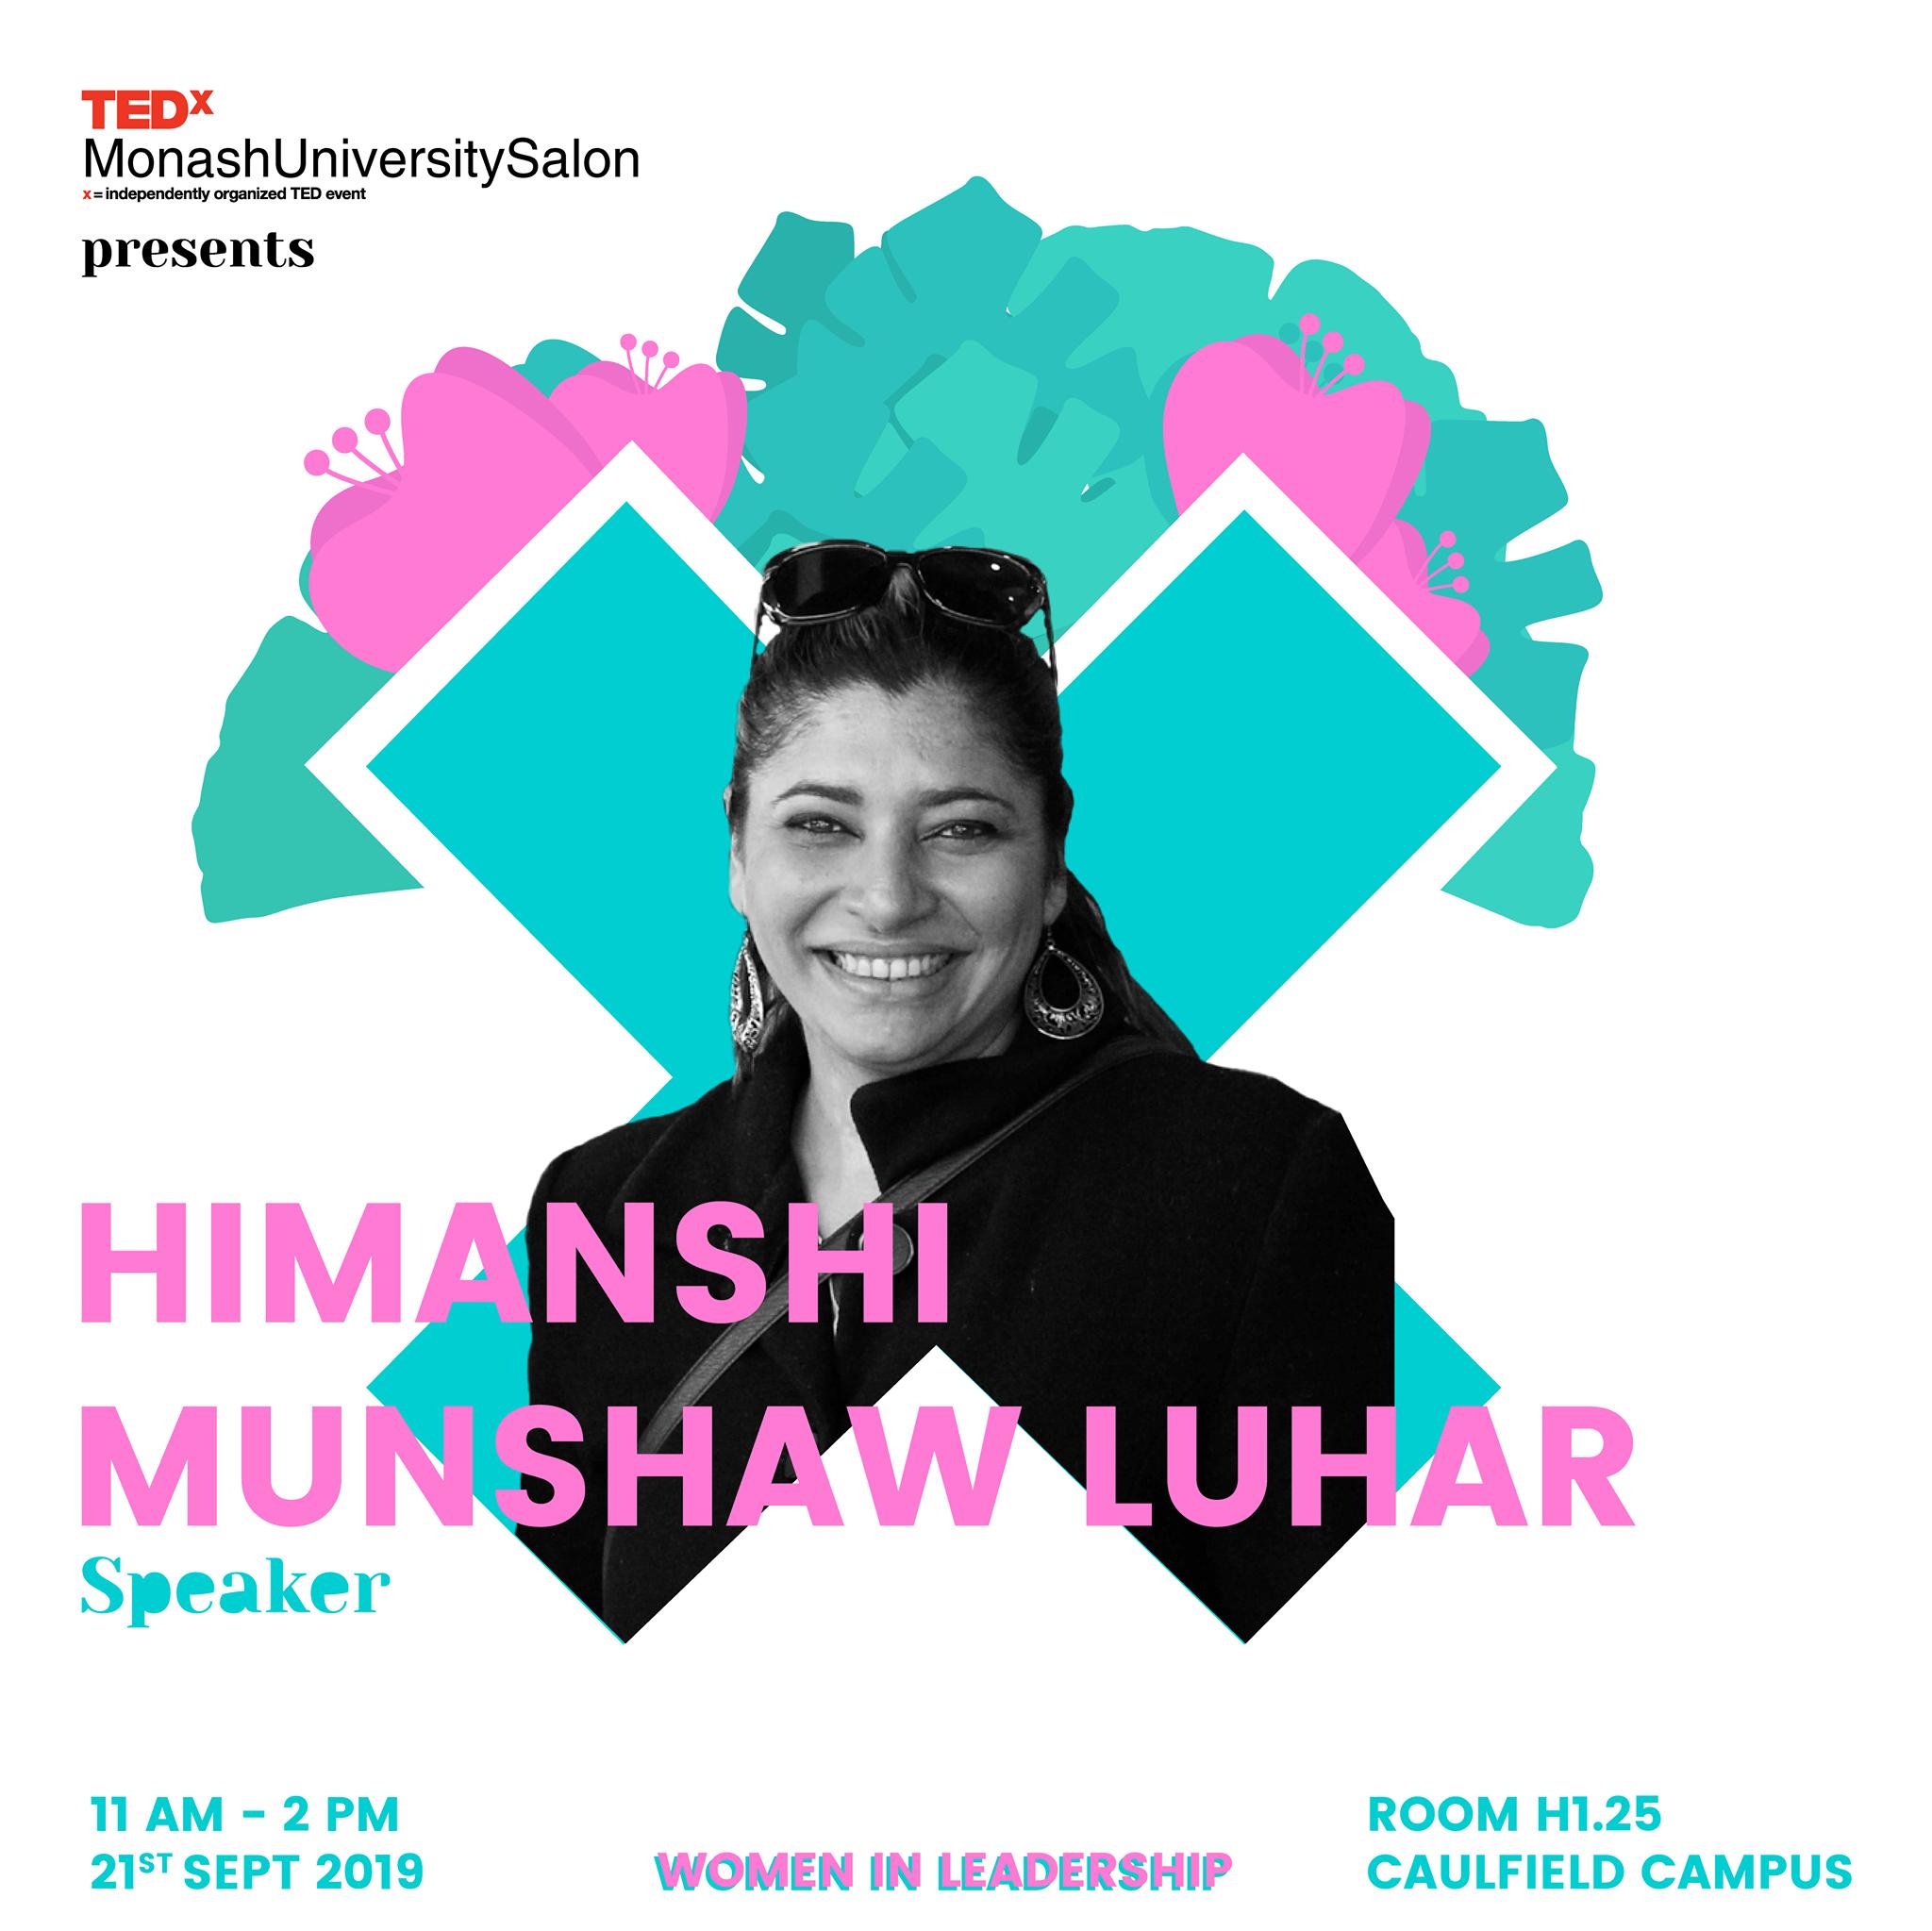 TEDX speaker image.png